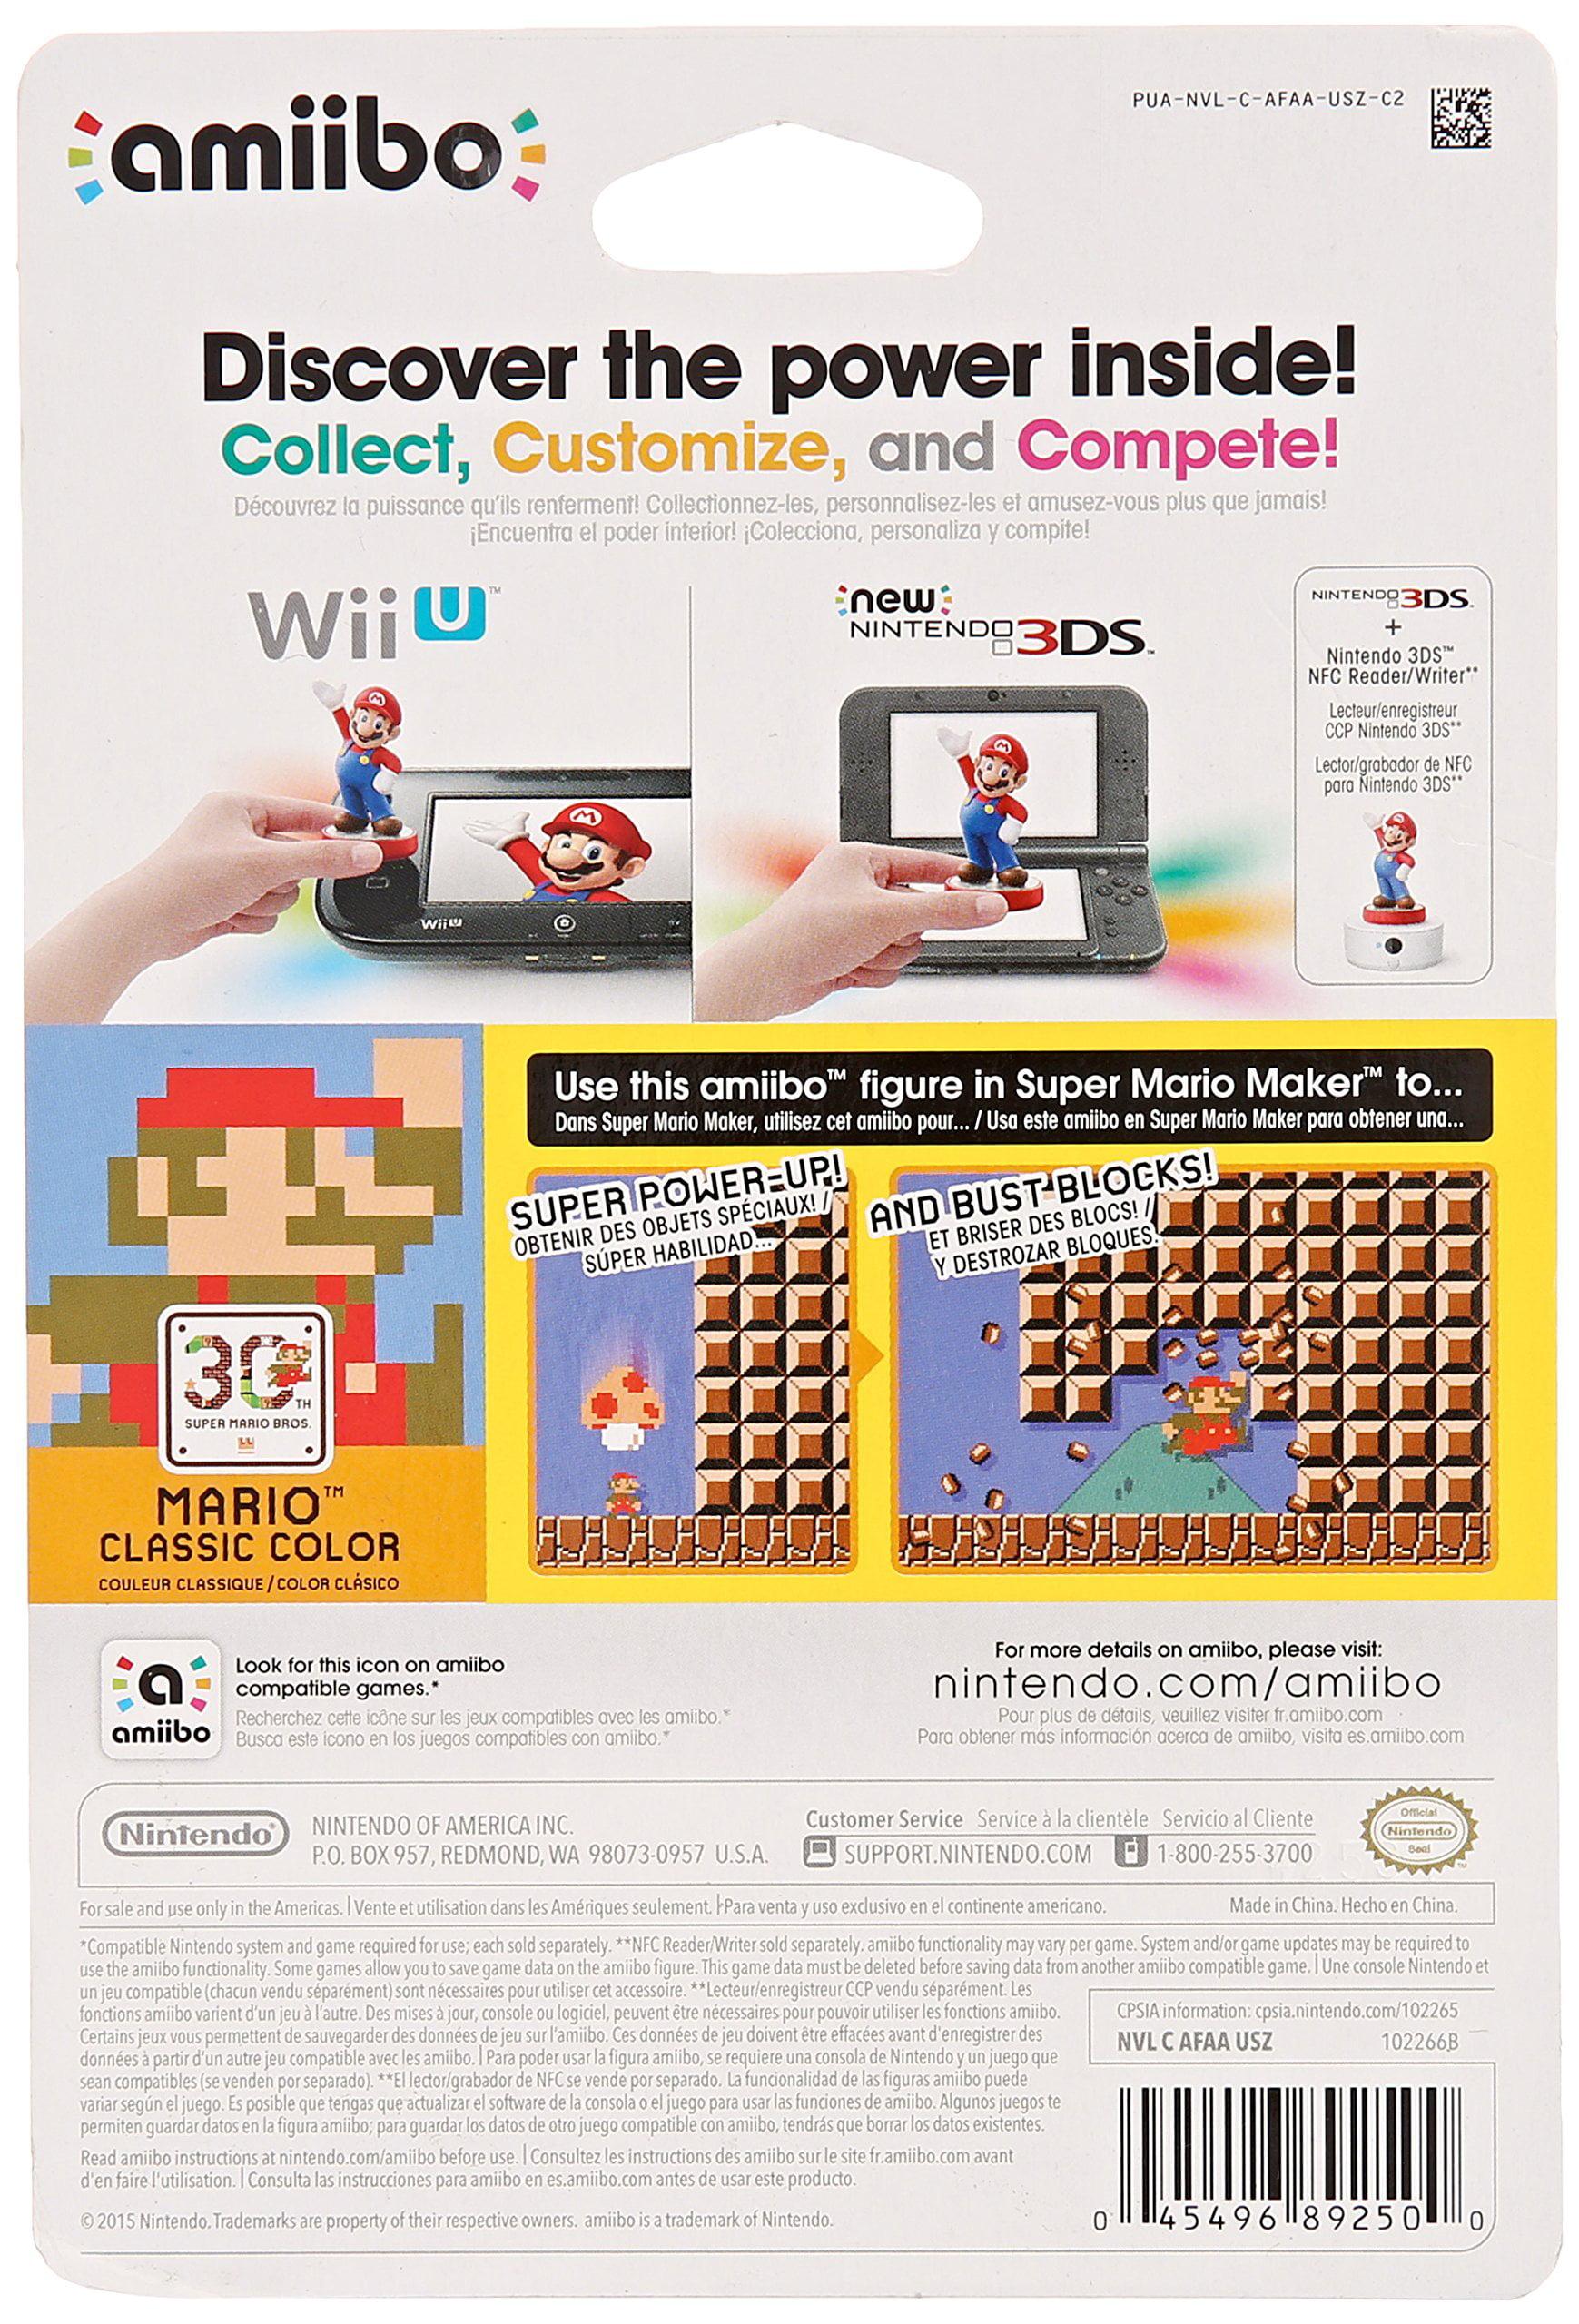 Mario Classic Color 30th Anniversary Series Nintendo